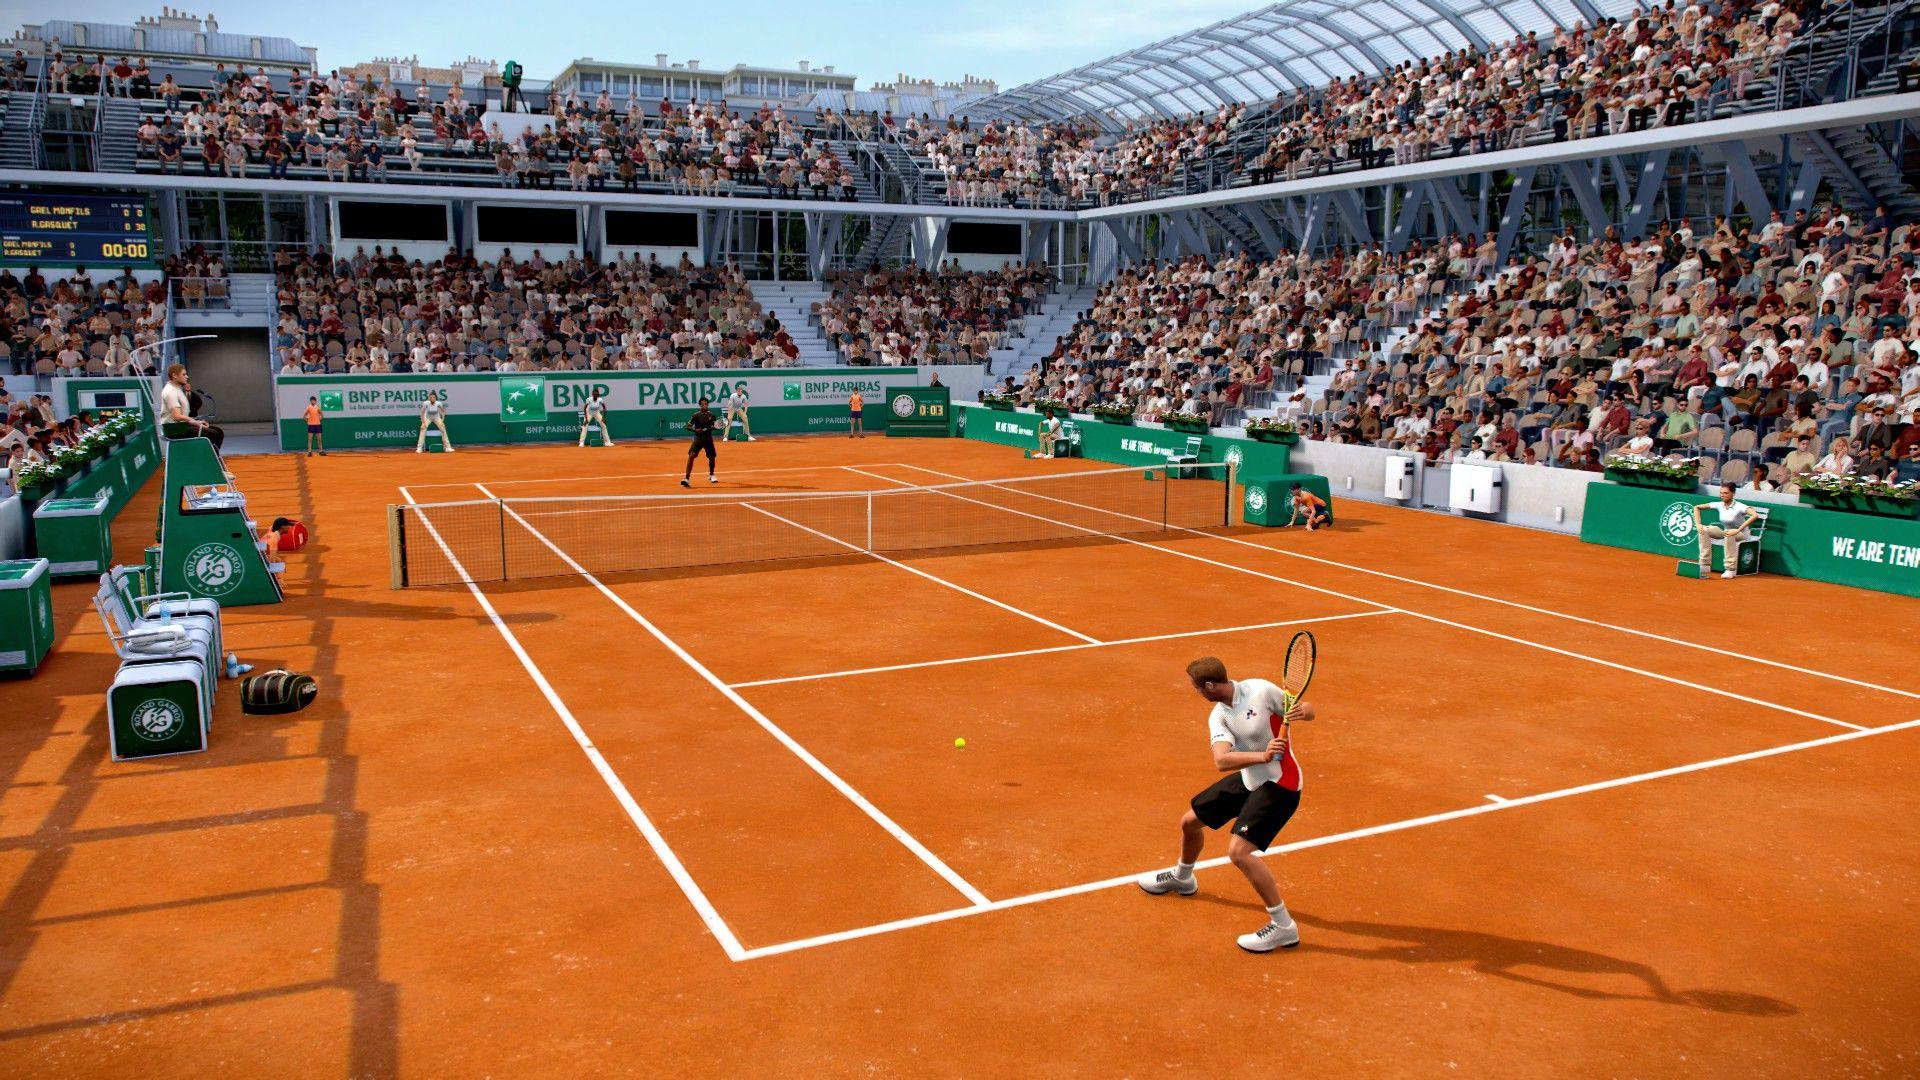 Tennis World Tour Roland Garros Edition Ad Ad Tour World Tennis Edition Tennis World Roland Garros Tennis Games